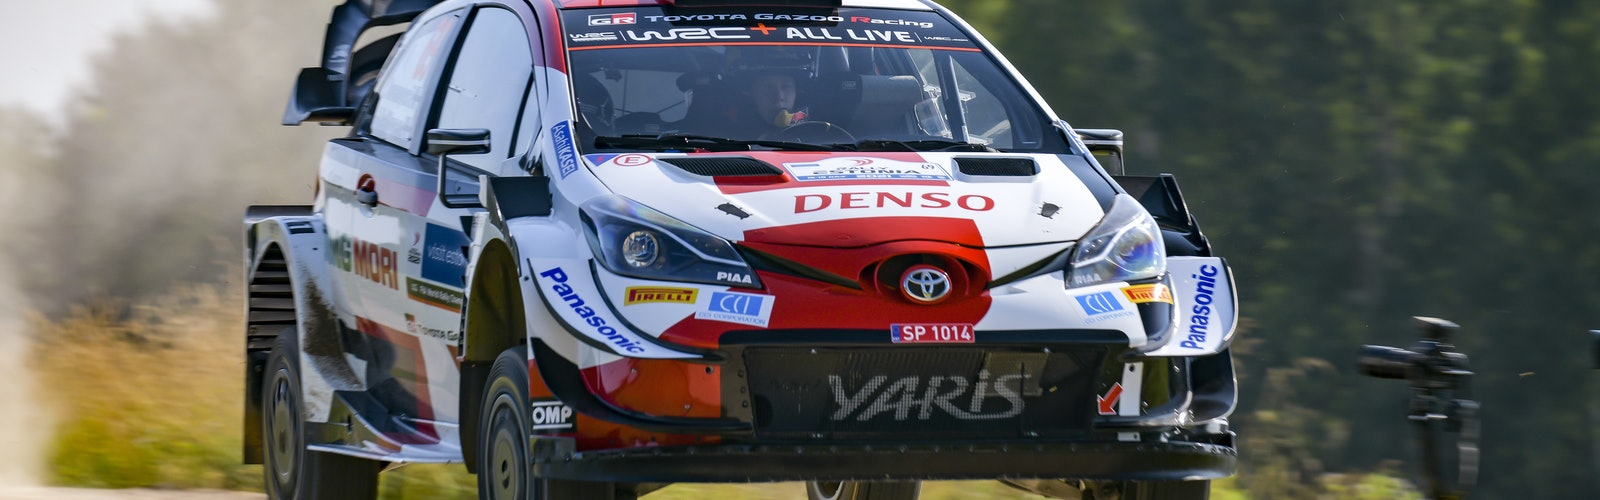 WRC_2021_Rd.7_102